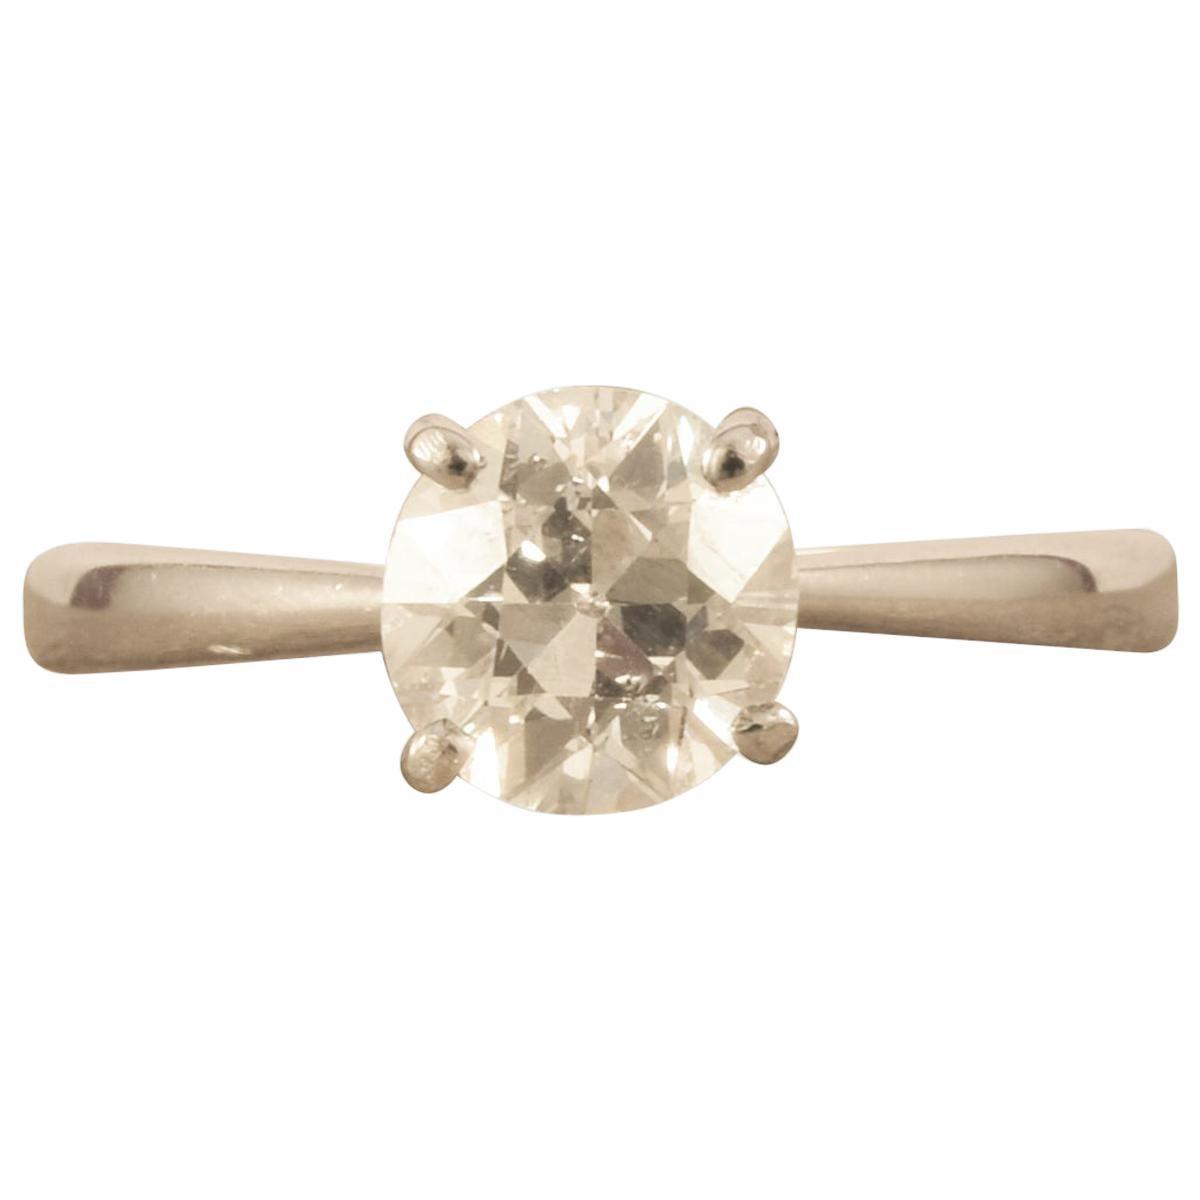 1.07 Carat Old European Cut Diamond Solitaire Ring in 18 Carat White Gold